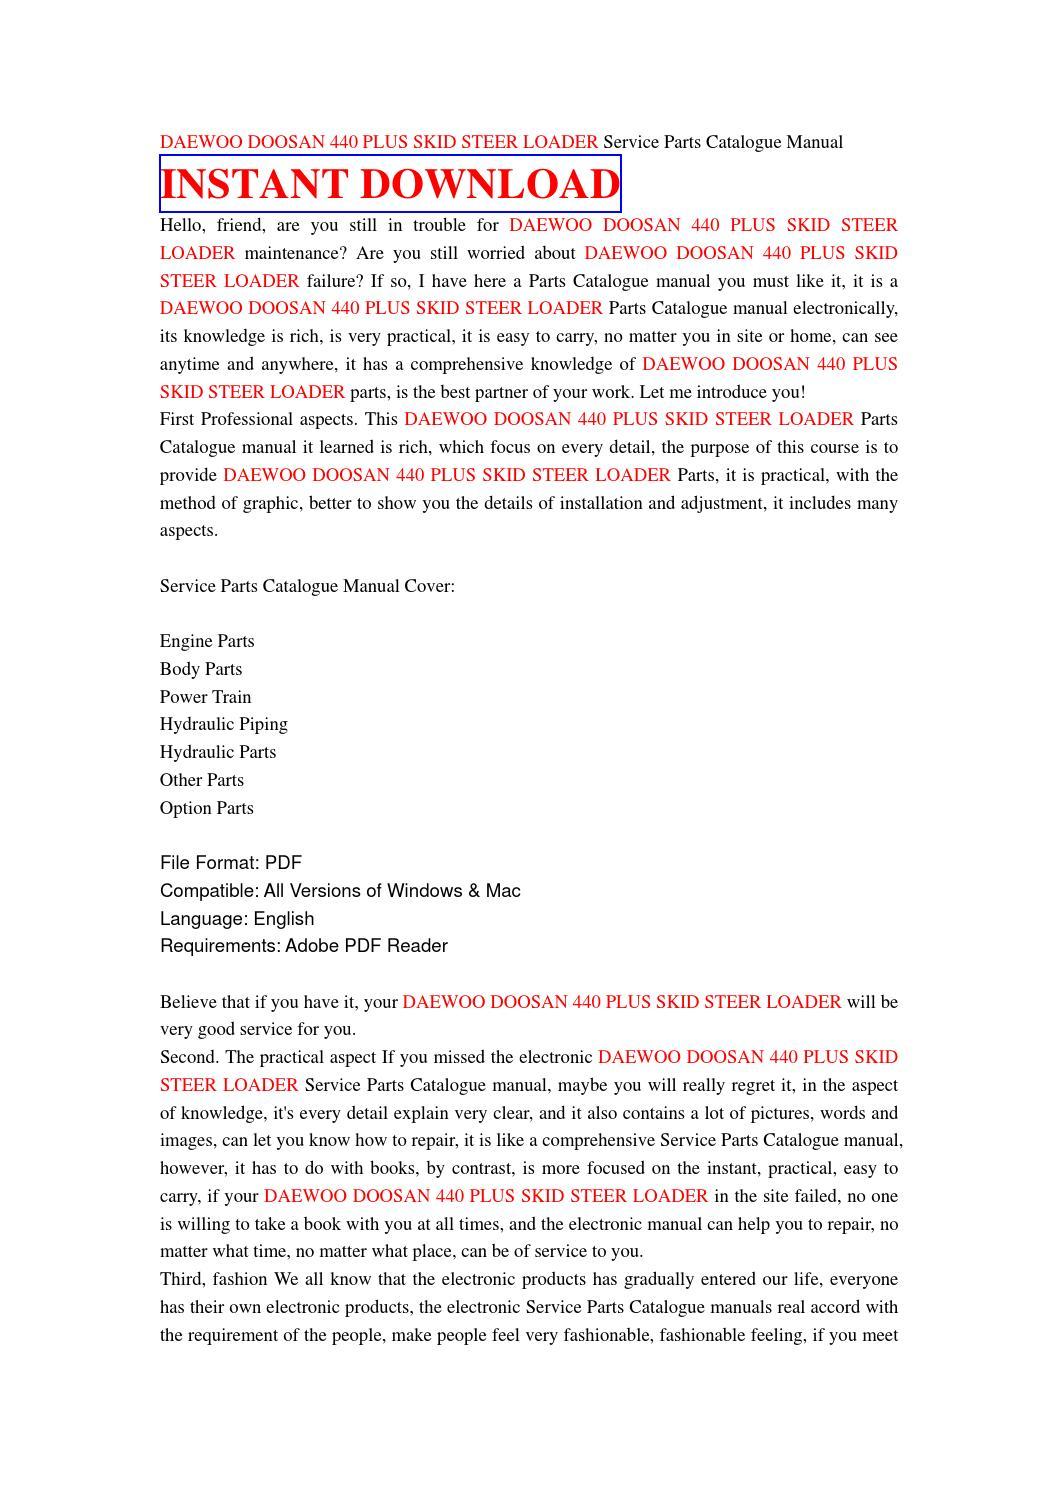 Daewoo doosan 440 plus skid steer loader service parts catalogue manual by  jhsefjn7 - issuu